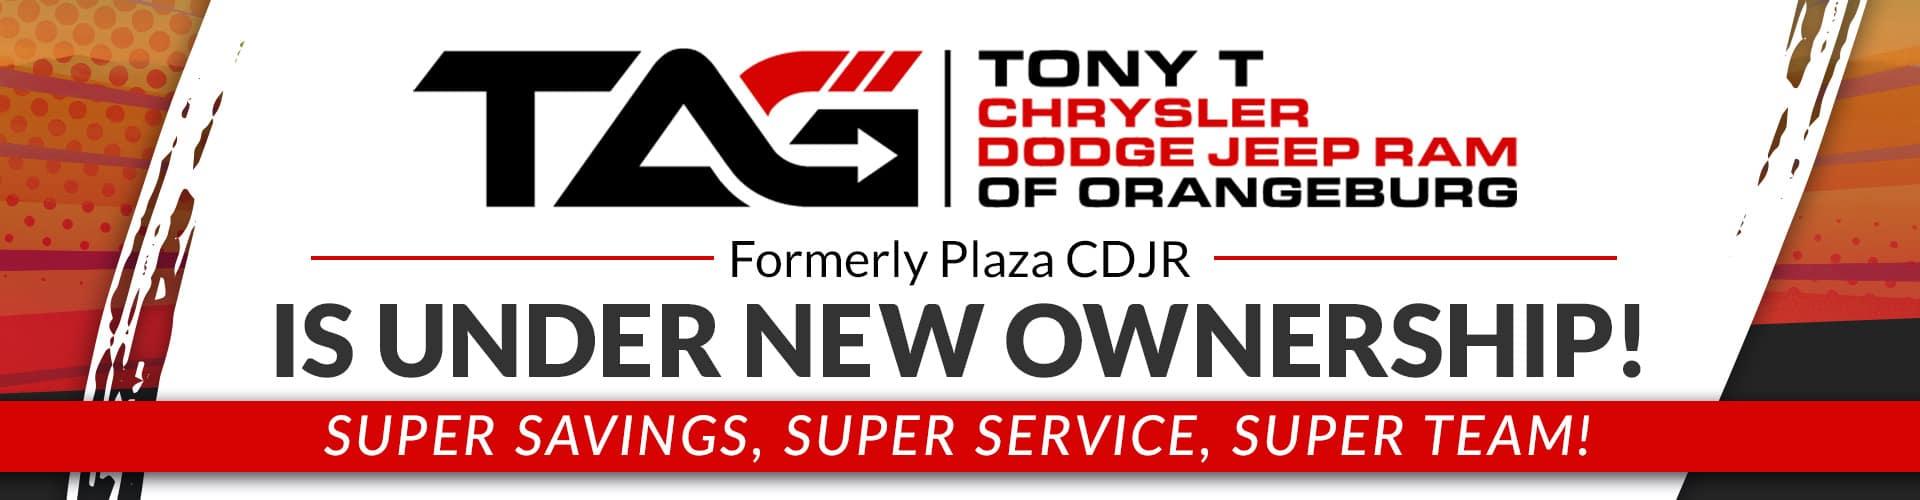 TonyTCDJR__NewOwnership_Banners0621